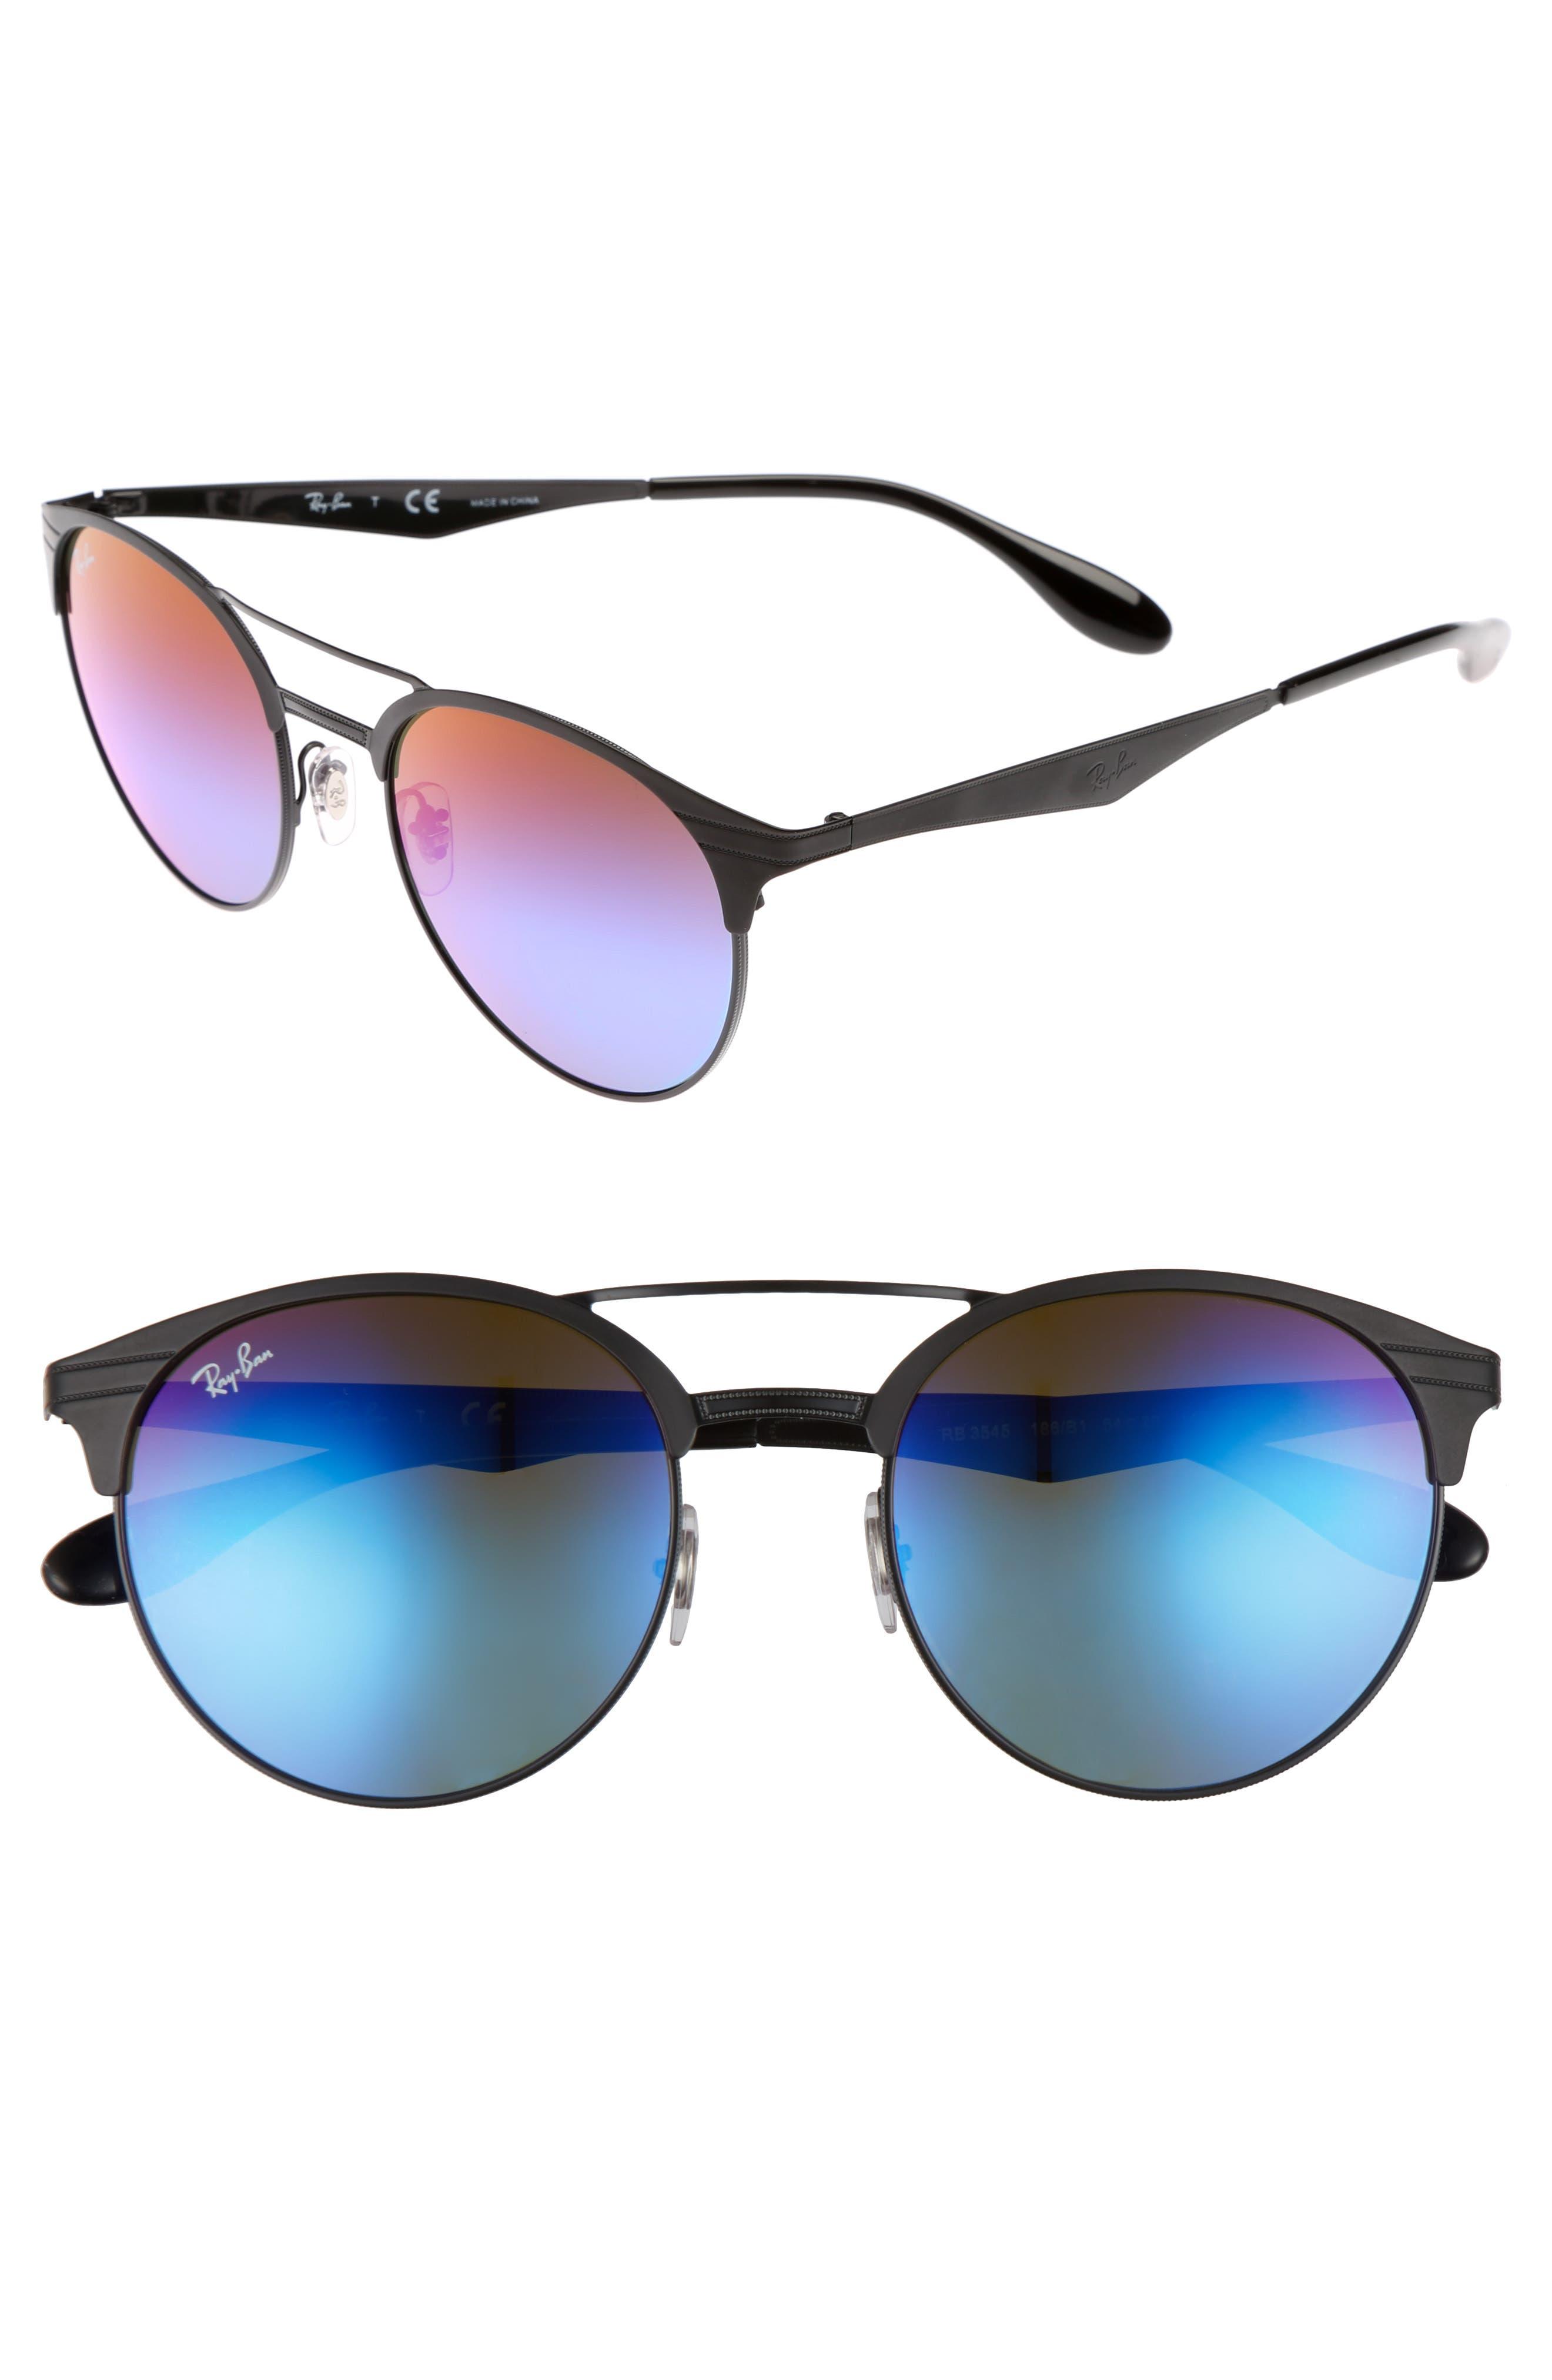 Highstreet 54mm Round Sunglasses,                             Main thumbnail 1, color,                             Black/ Blue/ Violet